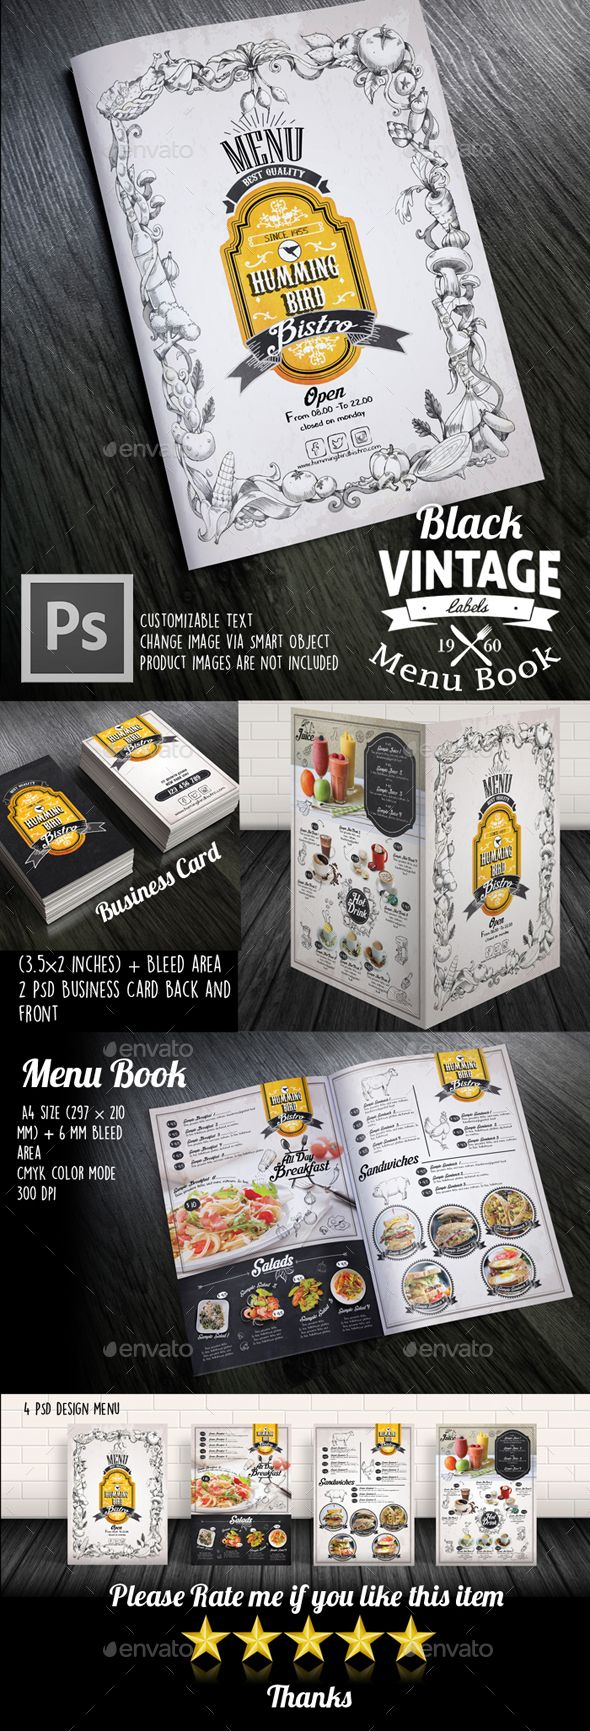 Black Vintage Menu Book  — PSD Template #delivery #bistro • Download ➝ https://graphicriver.net/item/black-vintage-menu-book/14044592?ref=pxcr